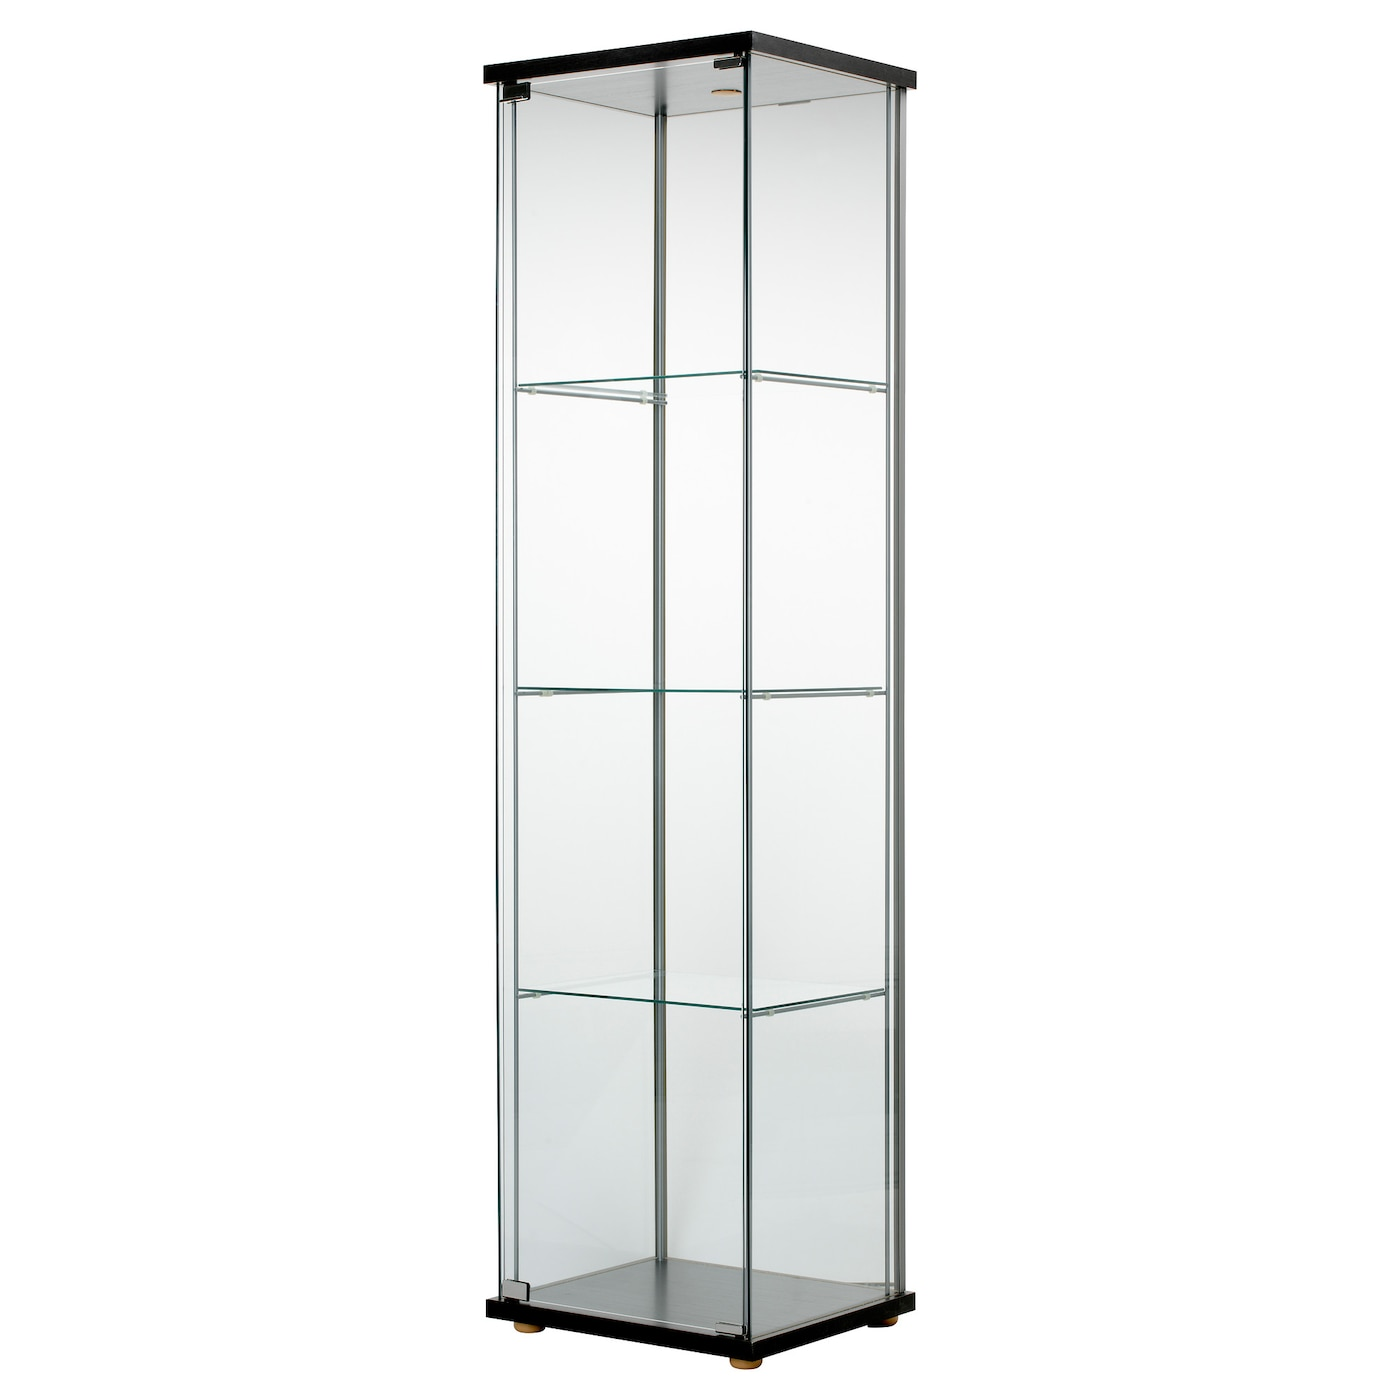 Vitrine Rangement De Salle Manger Ikea # Ikea Meuble Vitrine D'Angle Salon